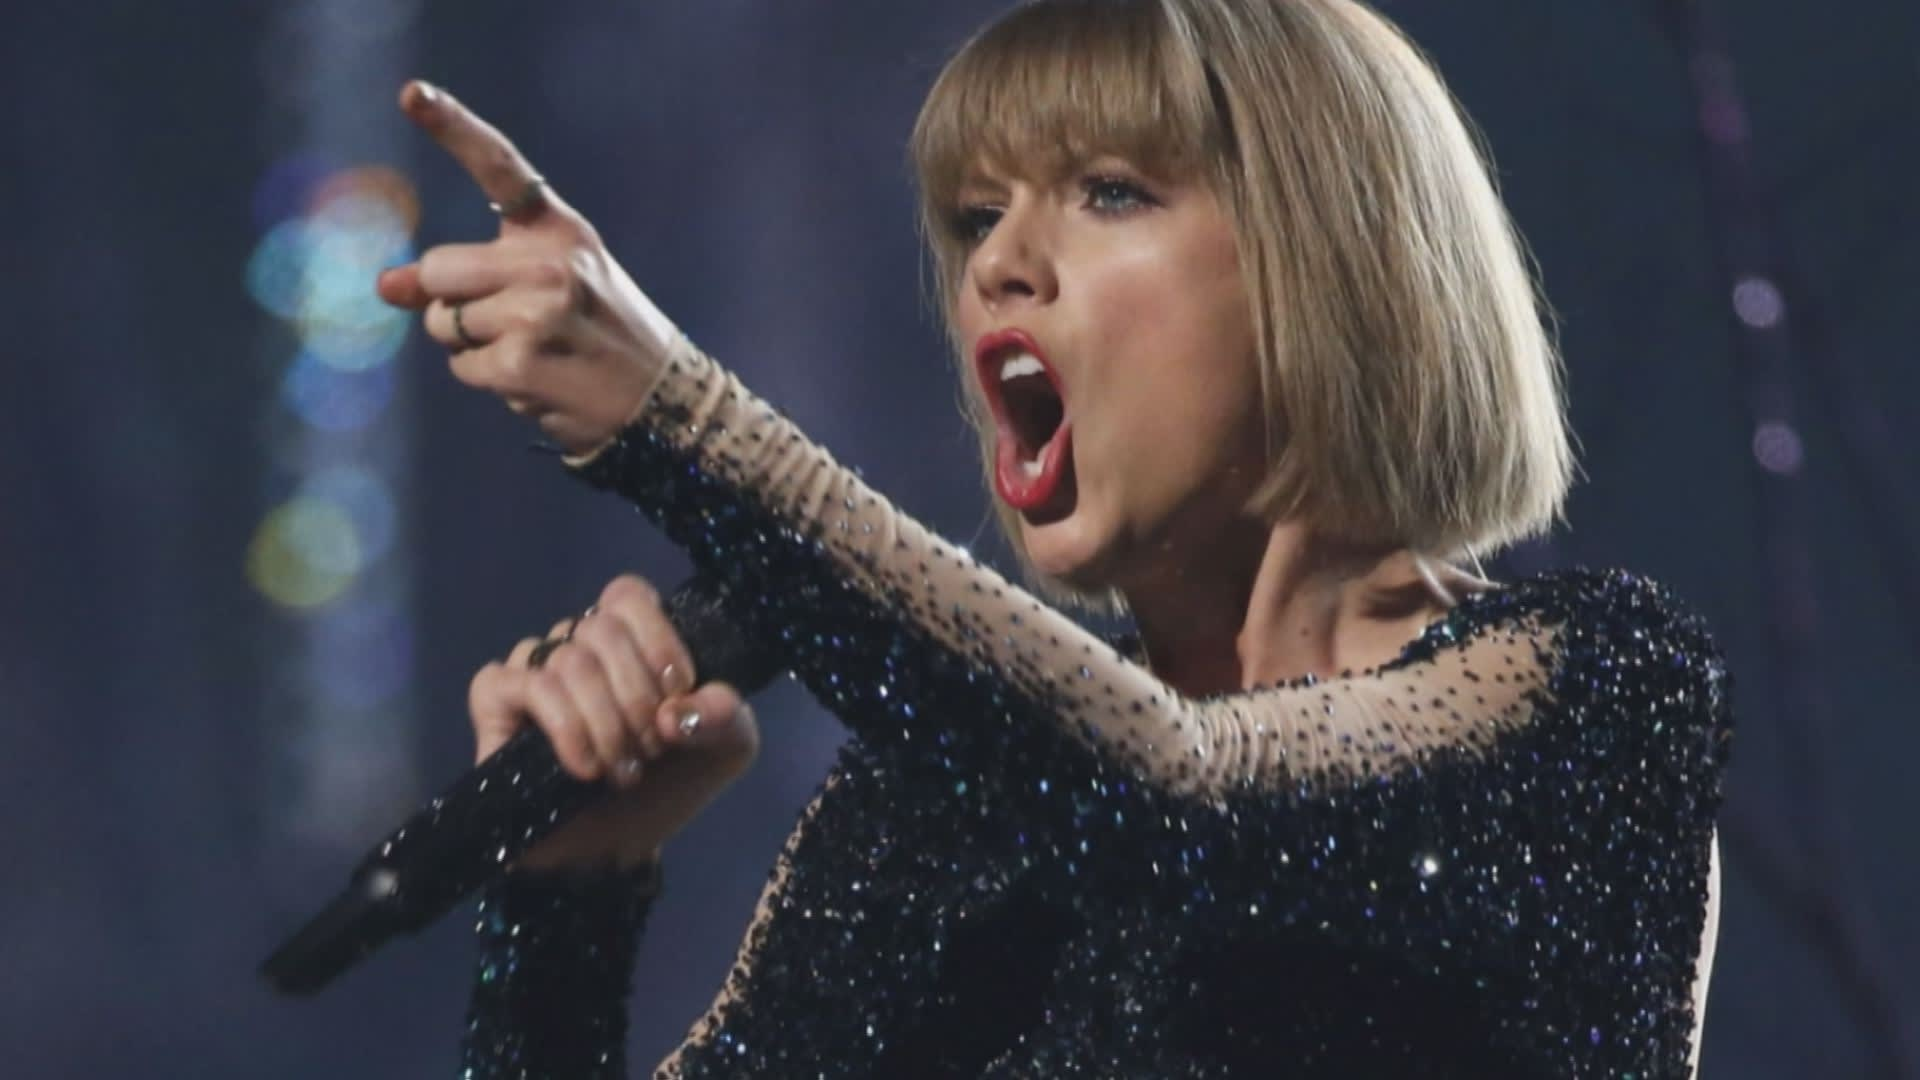 Taylor Swift boosts millennial voter registration